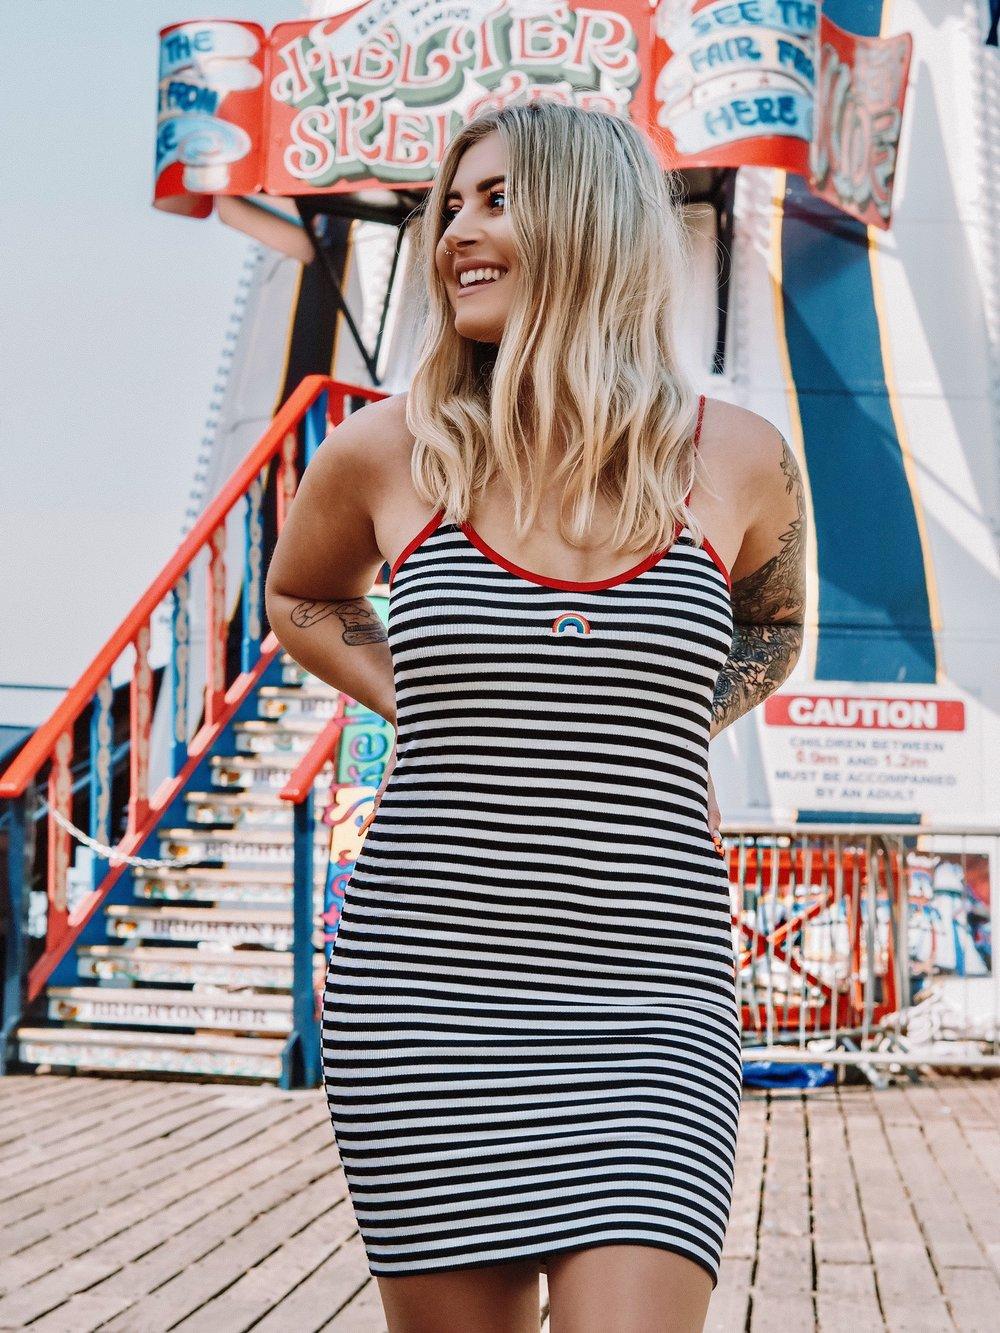 london brighton fashion blogger topshop summer